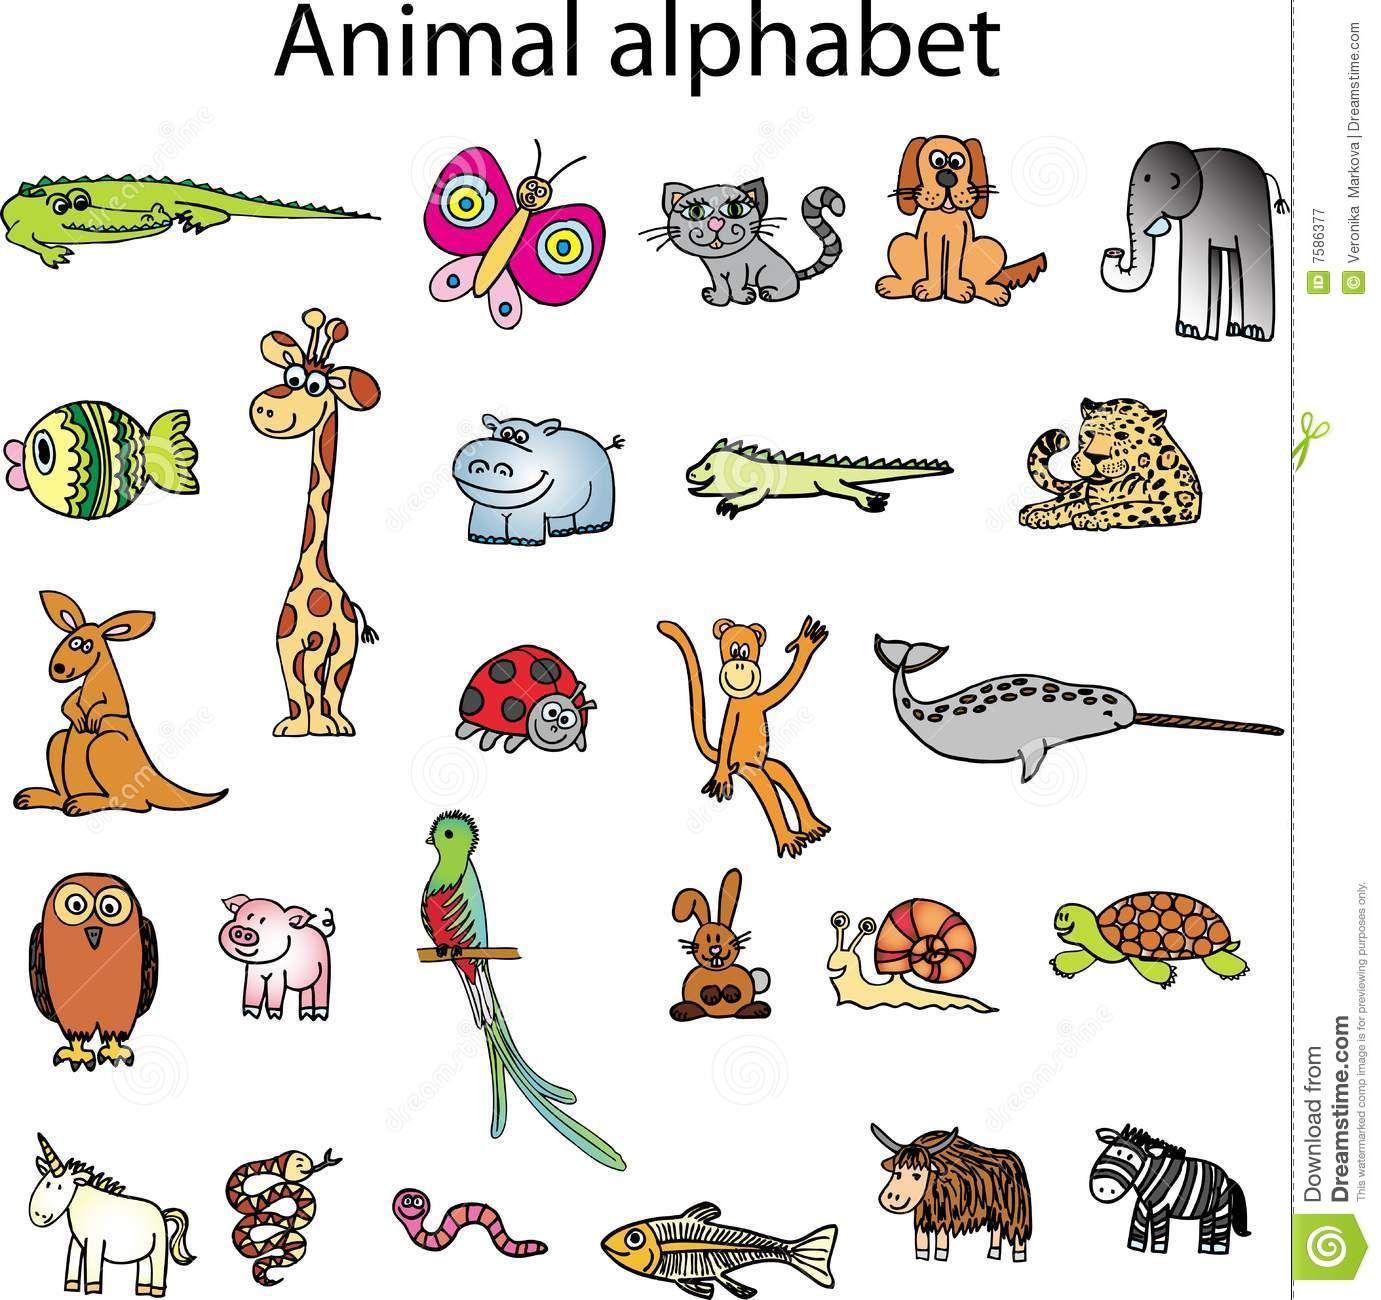 Animals From Animal Alphabet Royalty Free Stock